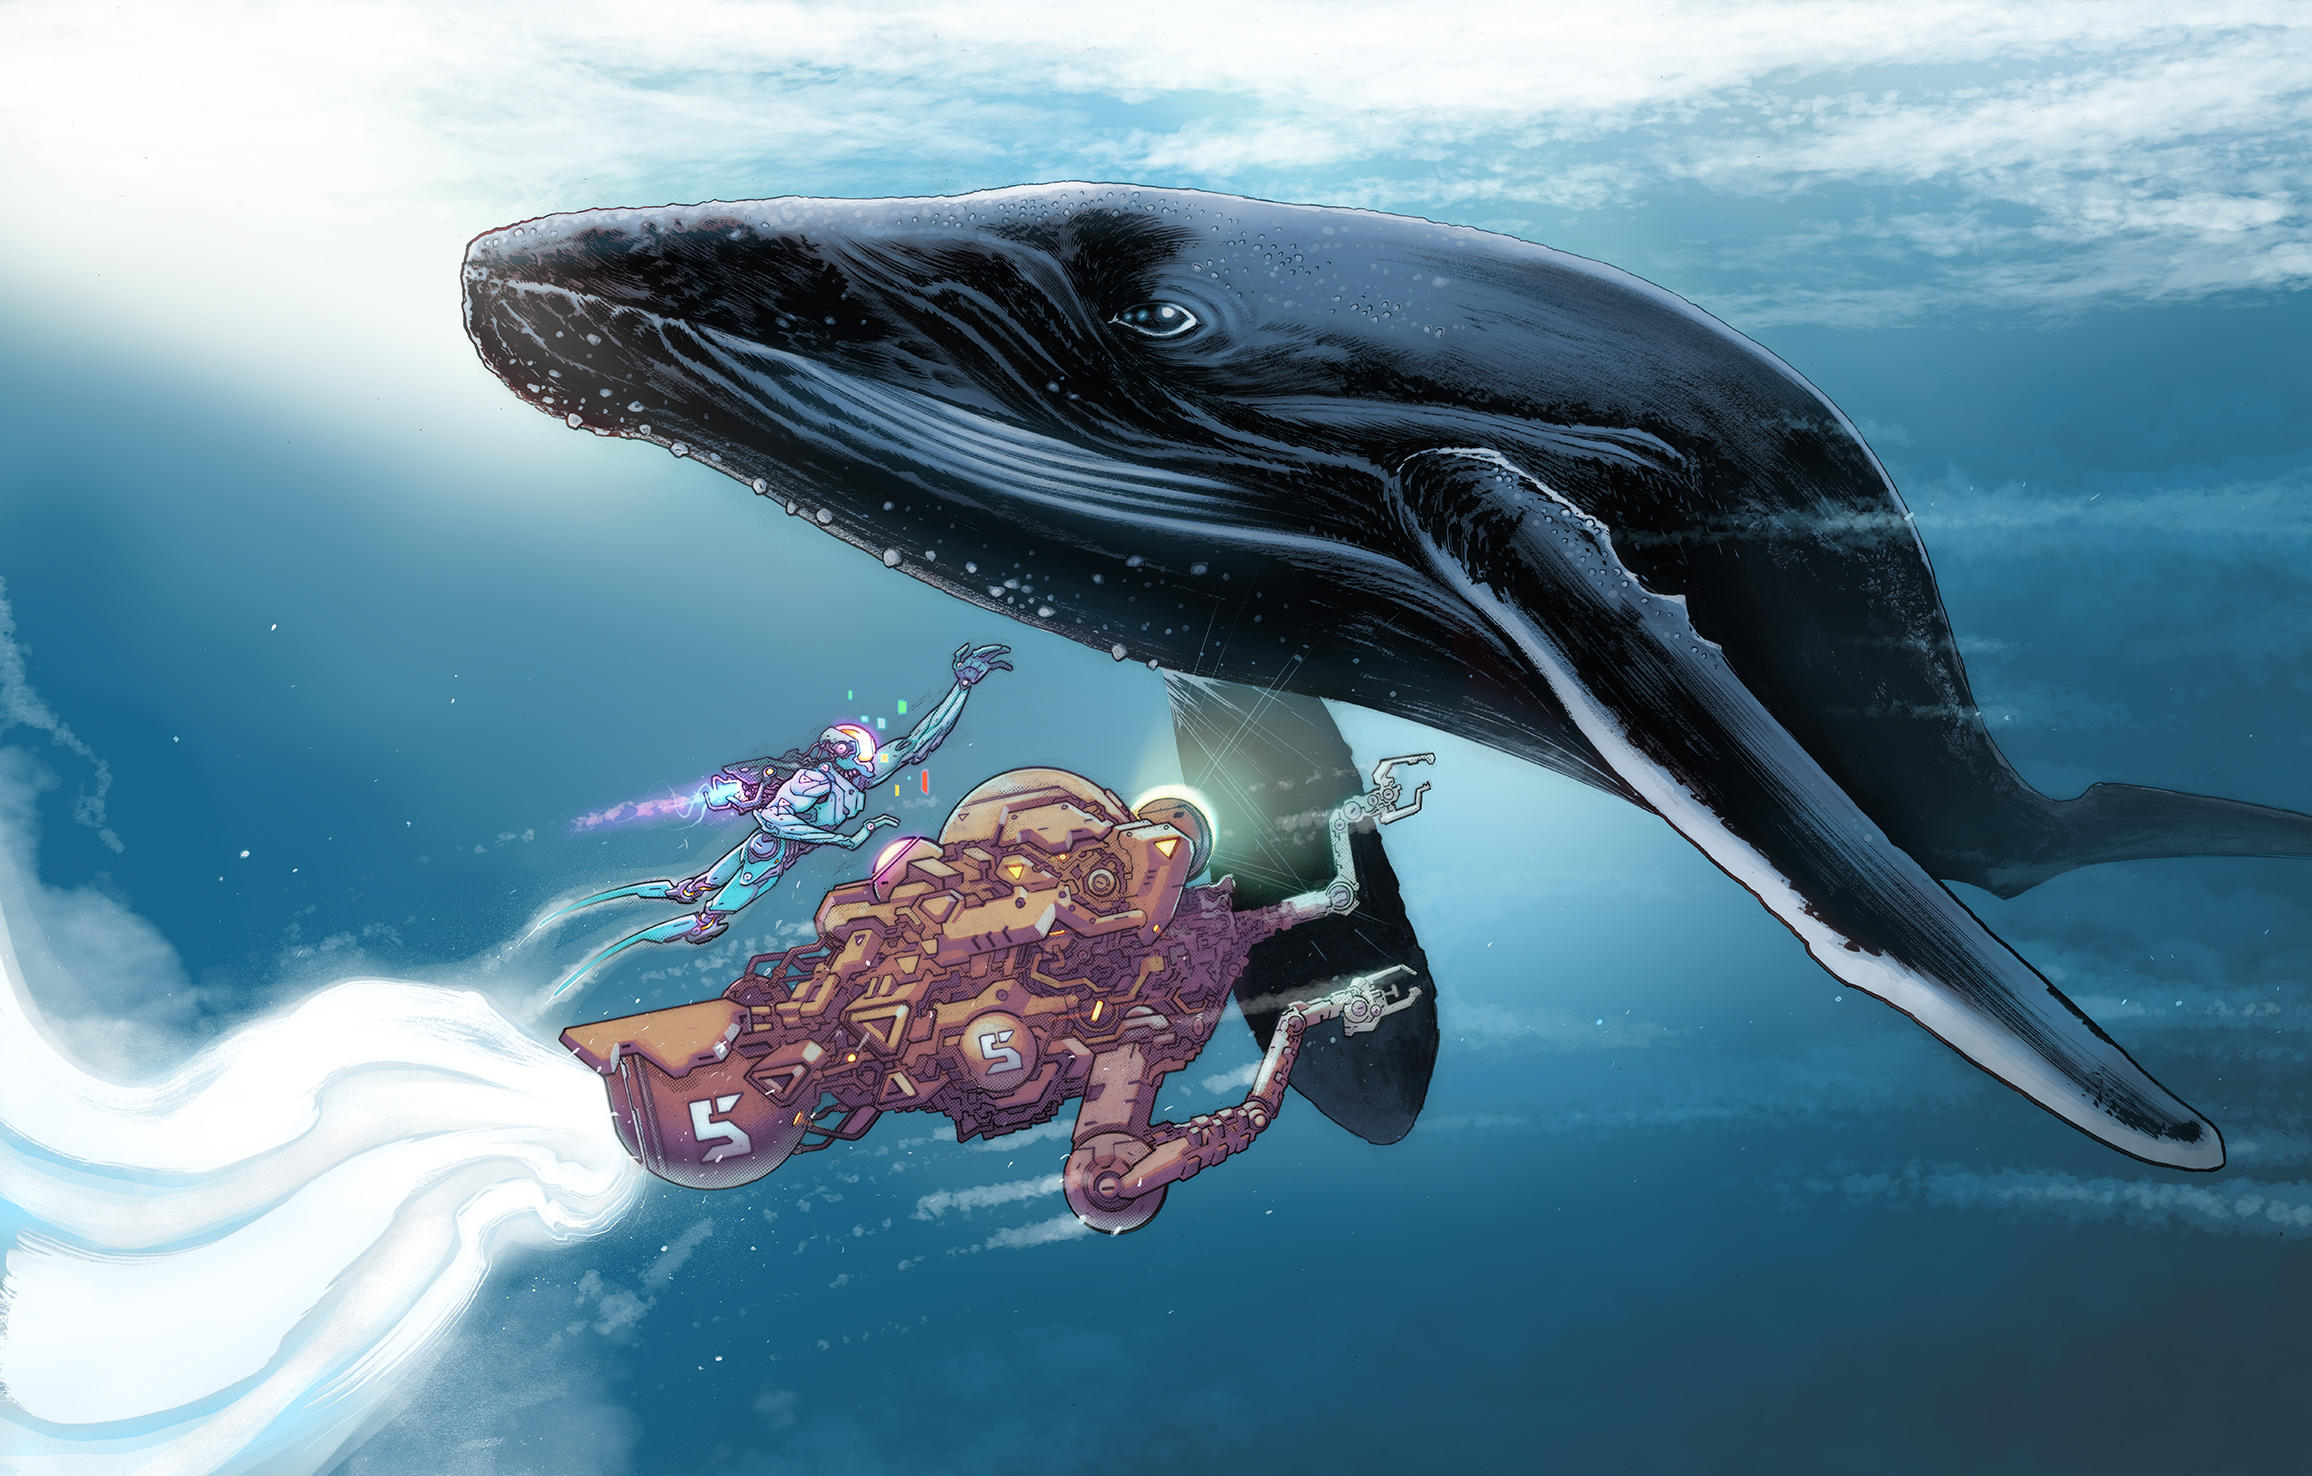 Whalebot by cliff-rathburn